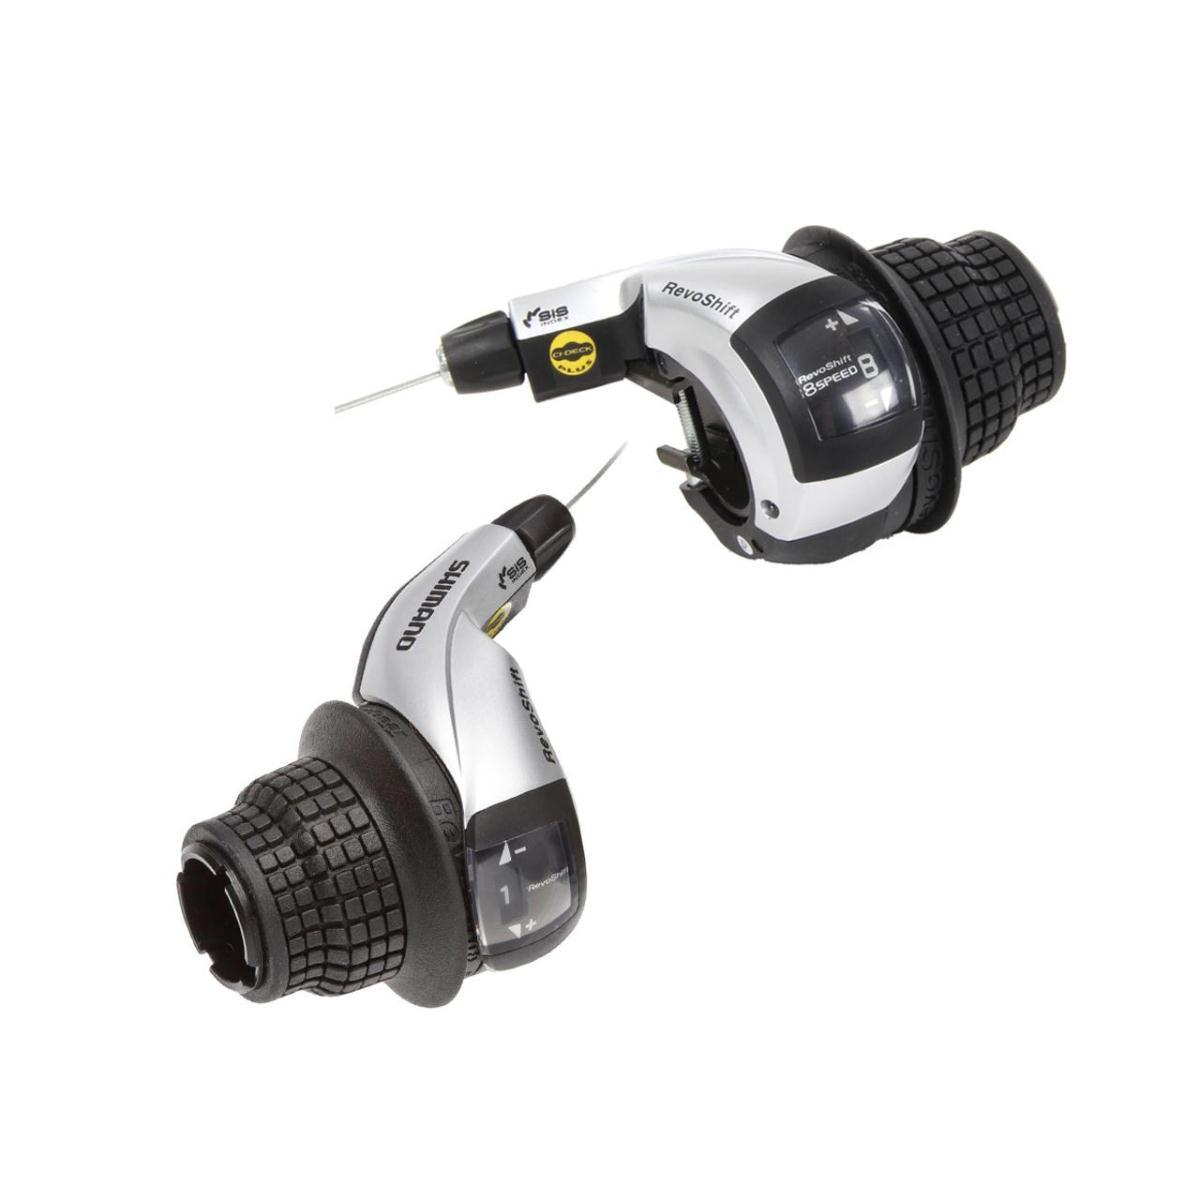 Манетки Shimano Tourney RevoShift, SL-RS45 пара 3+8 скоростей + тросики (OEM)